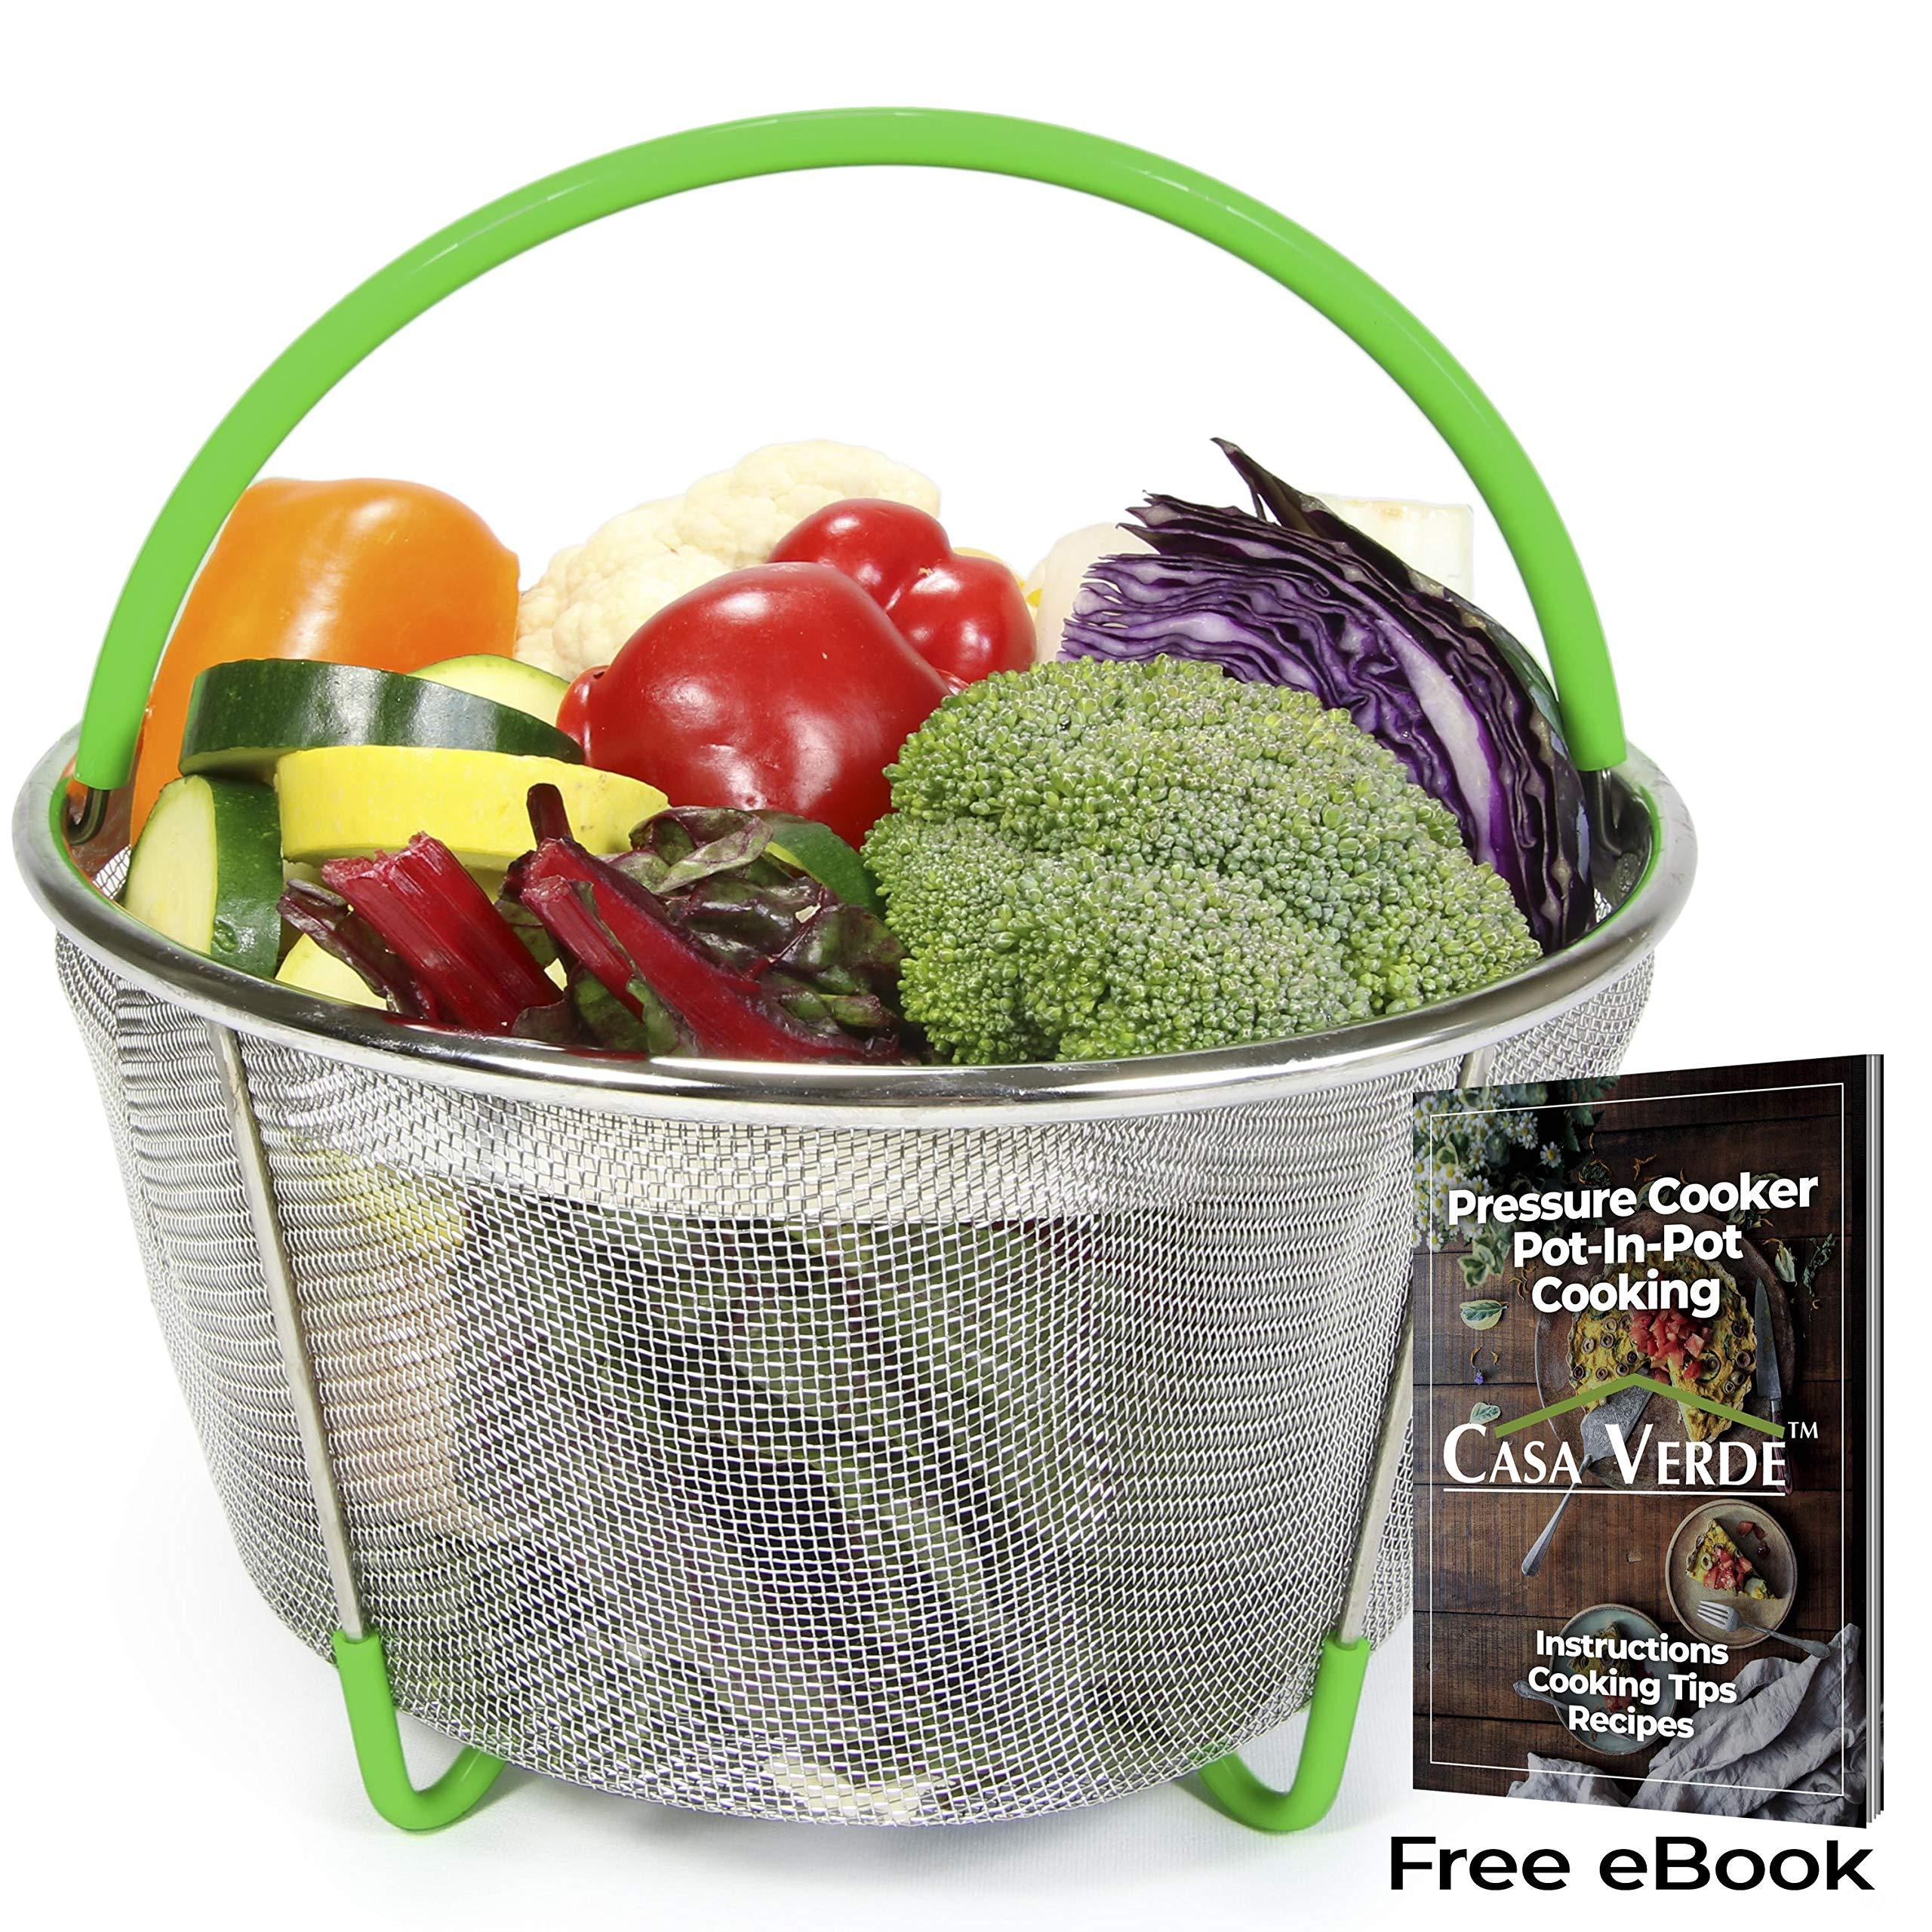 Casa Verde Instant Pot Steamer Basket Accessories, Egg, Vegetable Steamer Insert for 6/8 Qt Instant Pot Pressure Cooker, Stainless Steel Strainer/Colander, Silicone Covered Handle and Legs